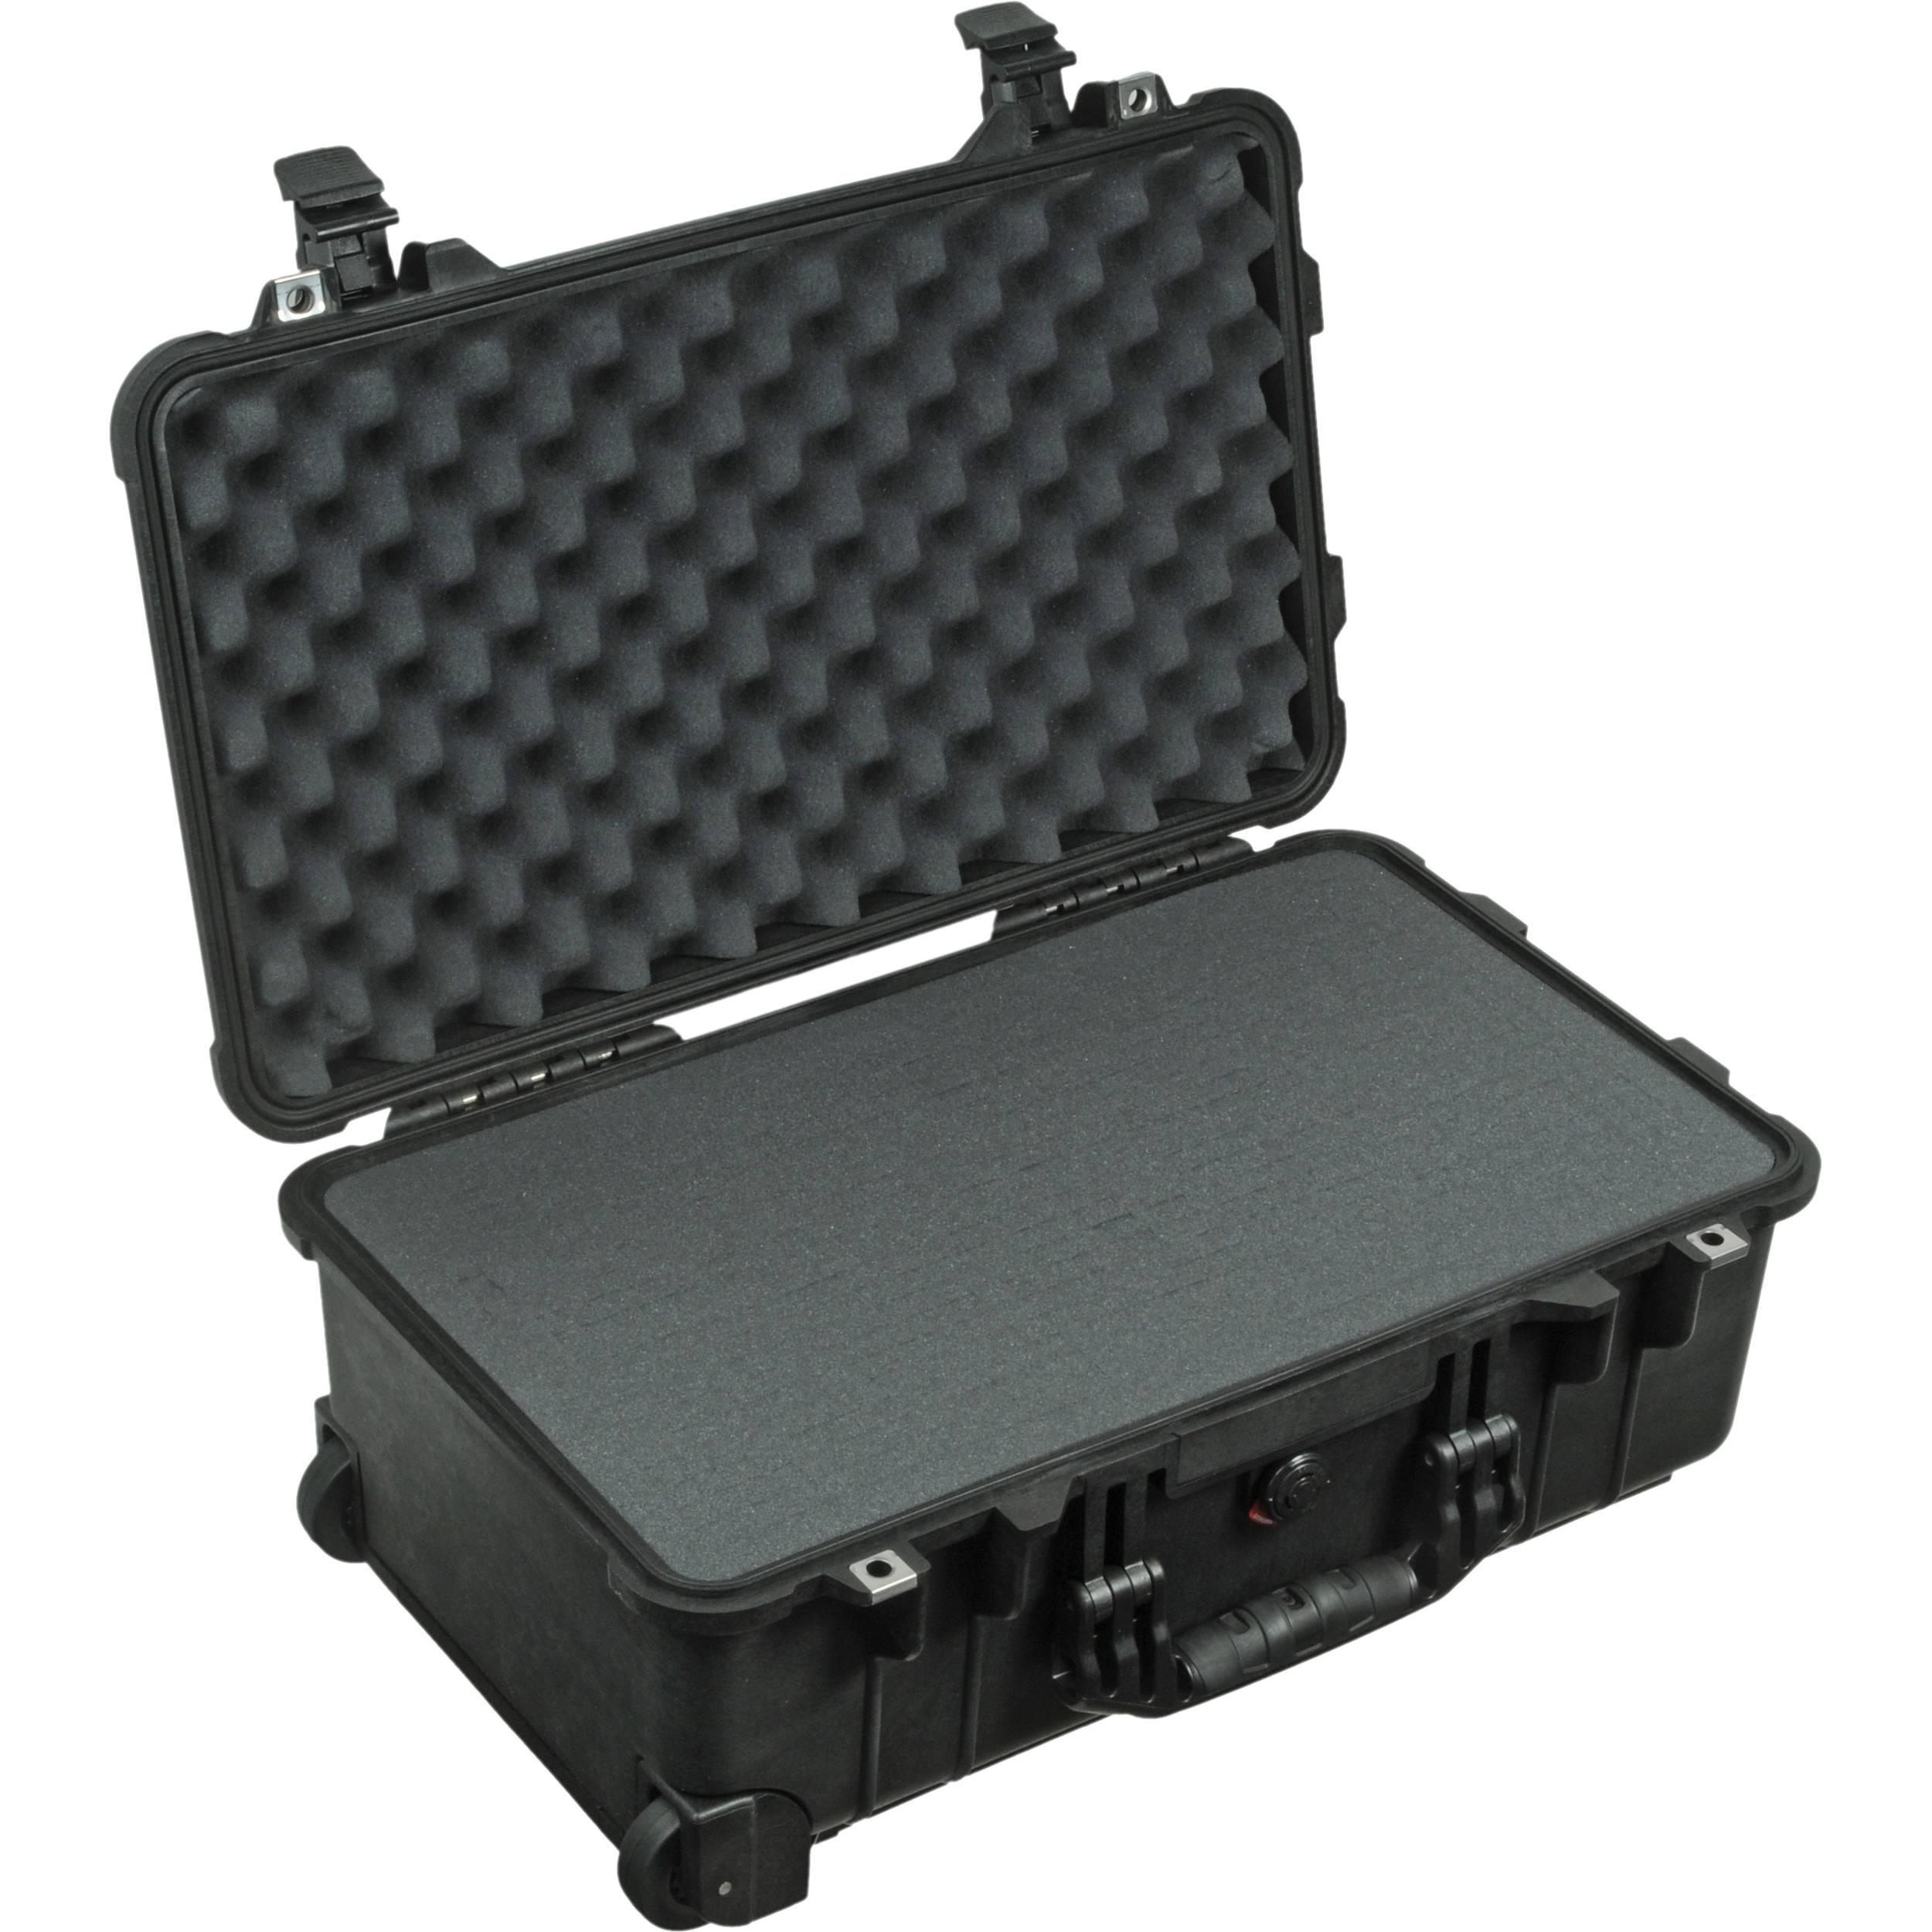 Case Peli 1510 skrzynka walizka aparat kamera